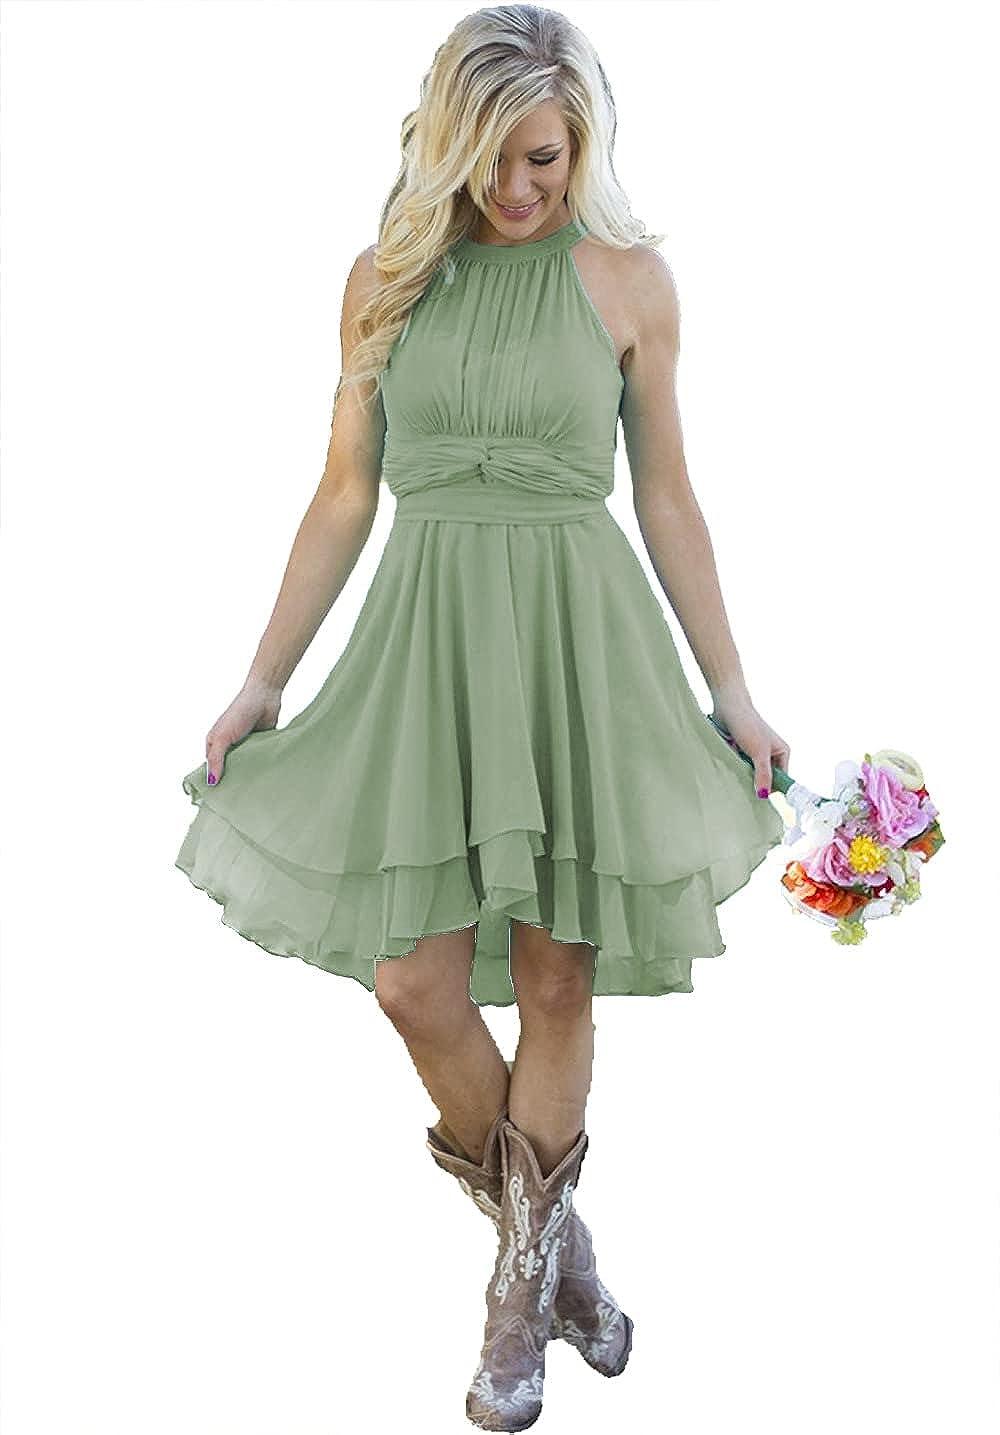 Women's Country Bridesmaid Party Dresses Short Knee Length Halter Summer Western Chiffon Wedding Guest Dress 2021 B040